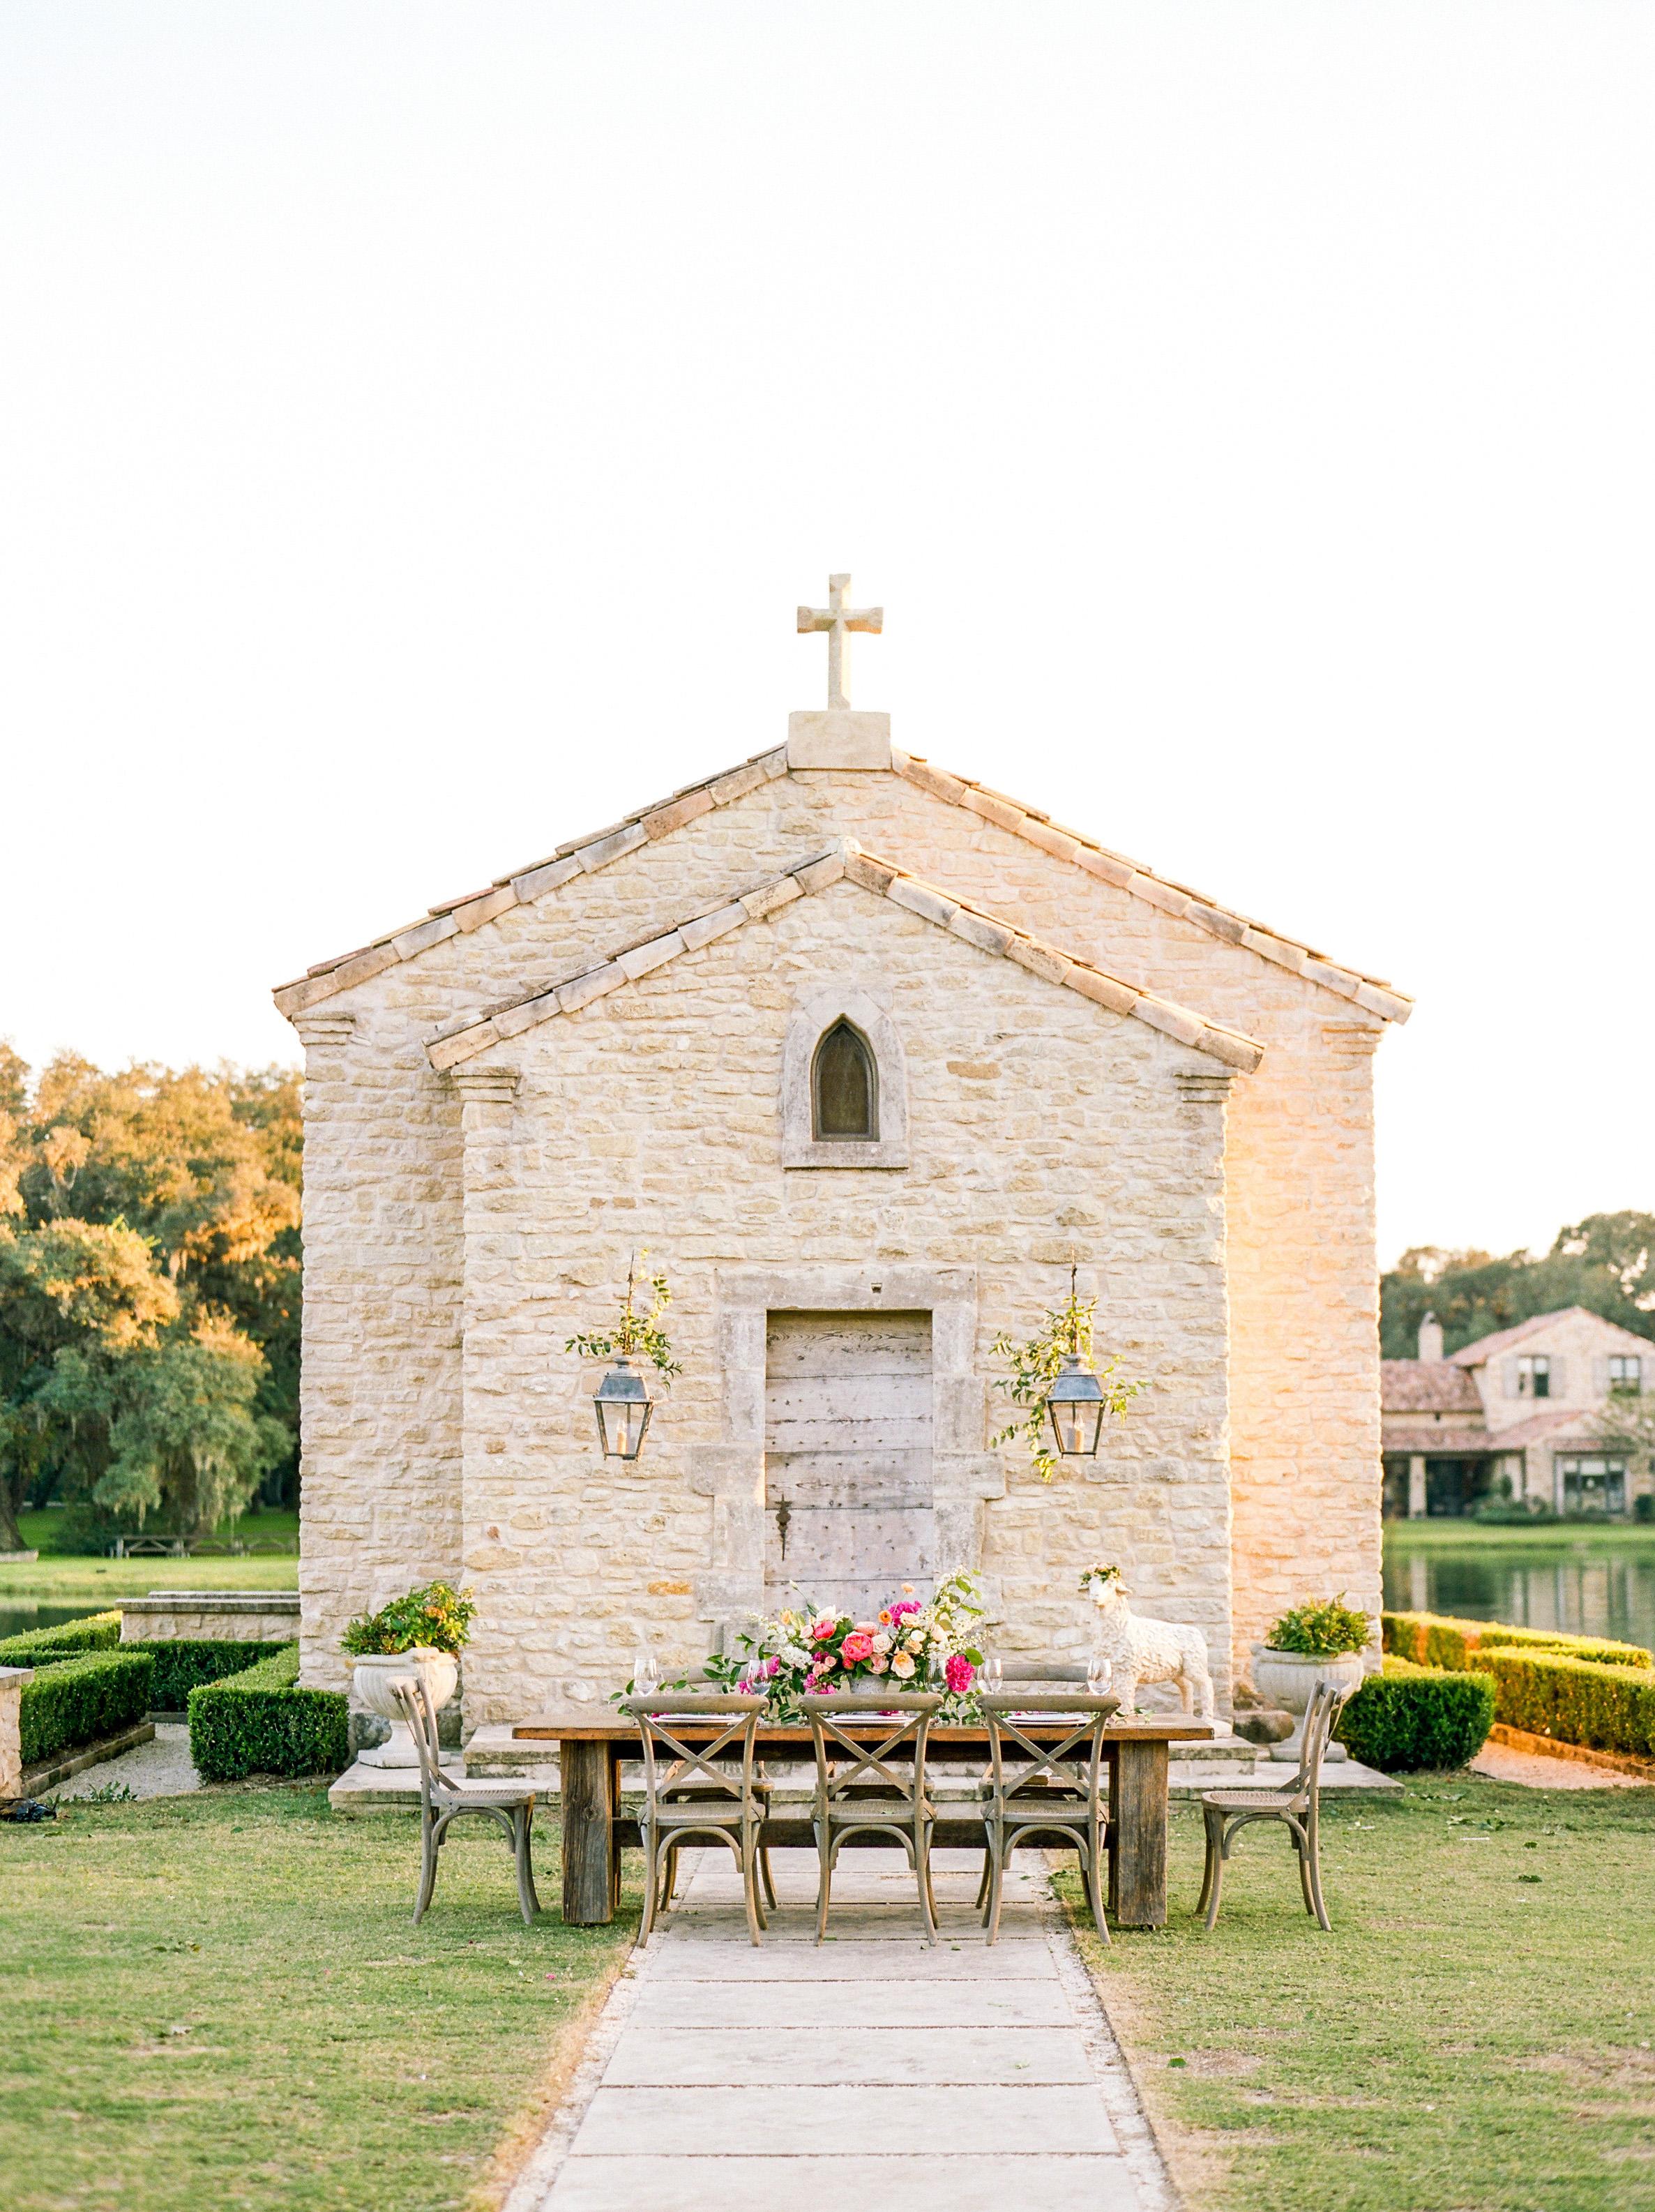 Top-Houston-Wedding-Photographer-Dana-Fernandez-Photography-The-Clubs-At-Houston-Oaks-Country-Club-Belle-Events-Film-Fine-Art-Destination-16.jpg